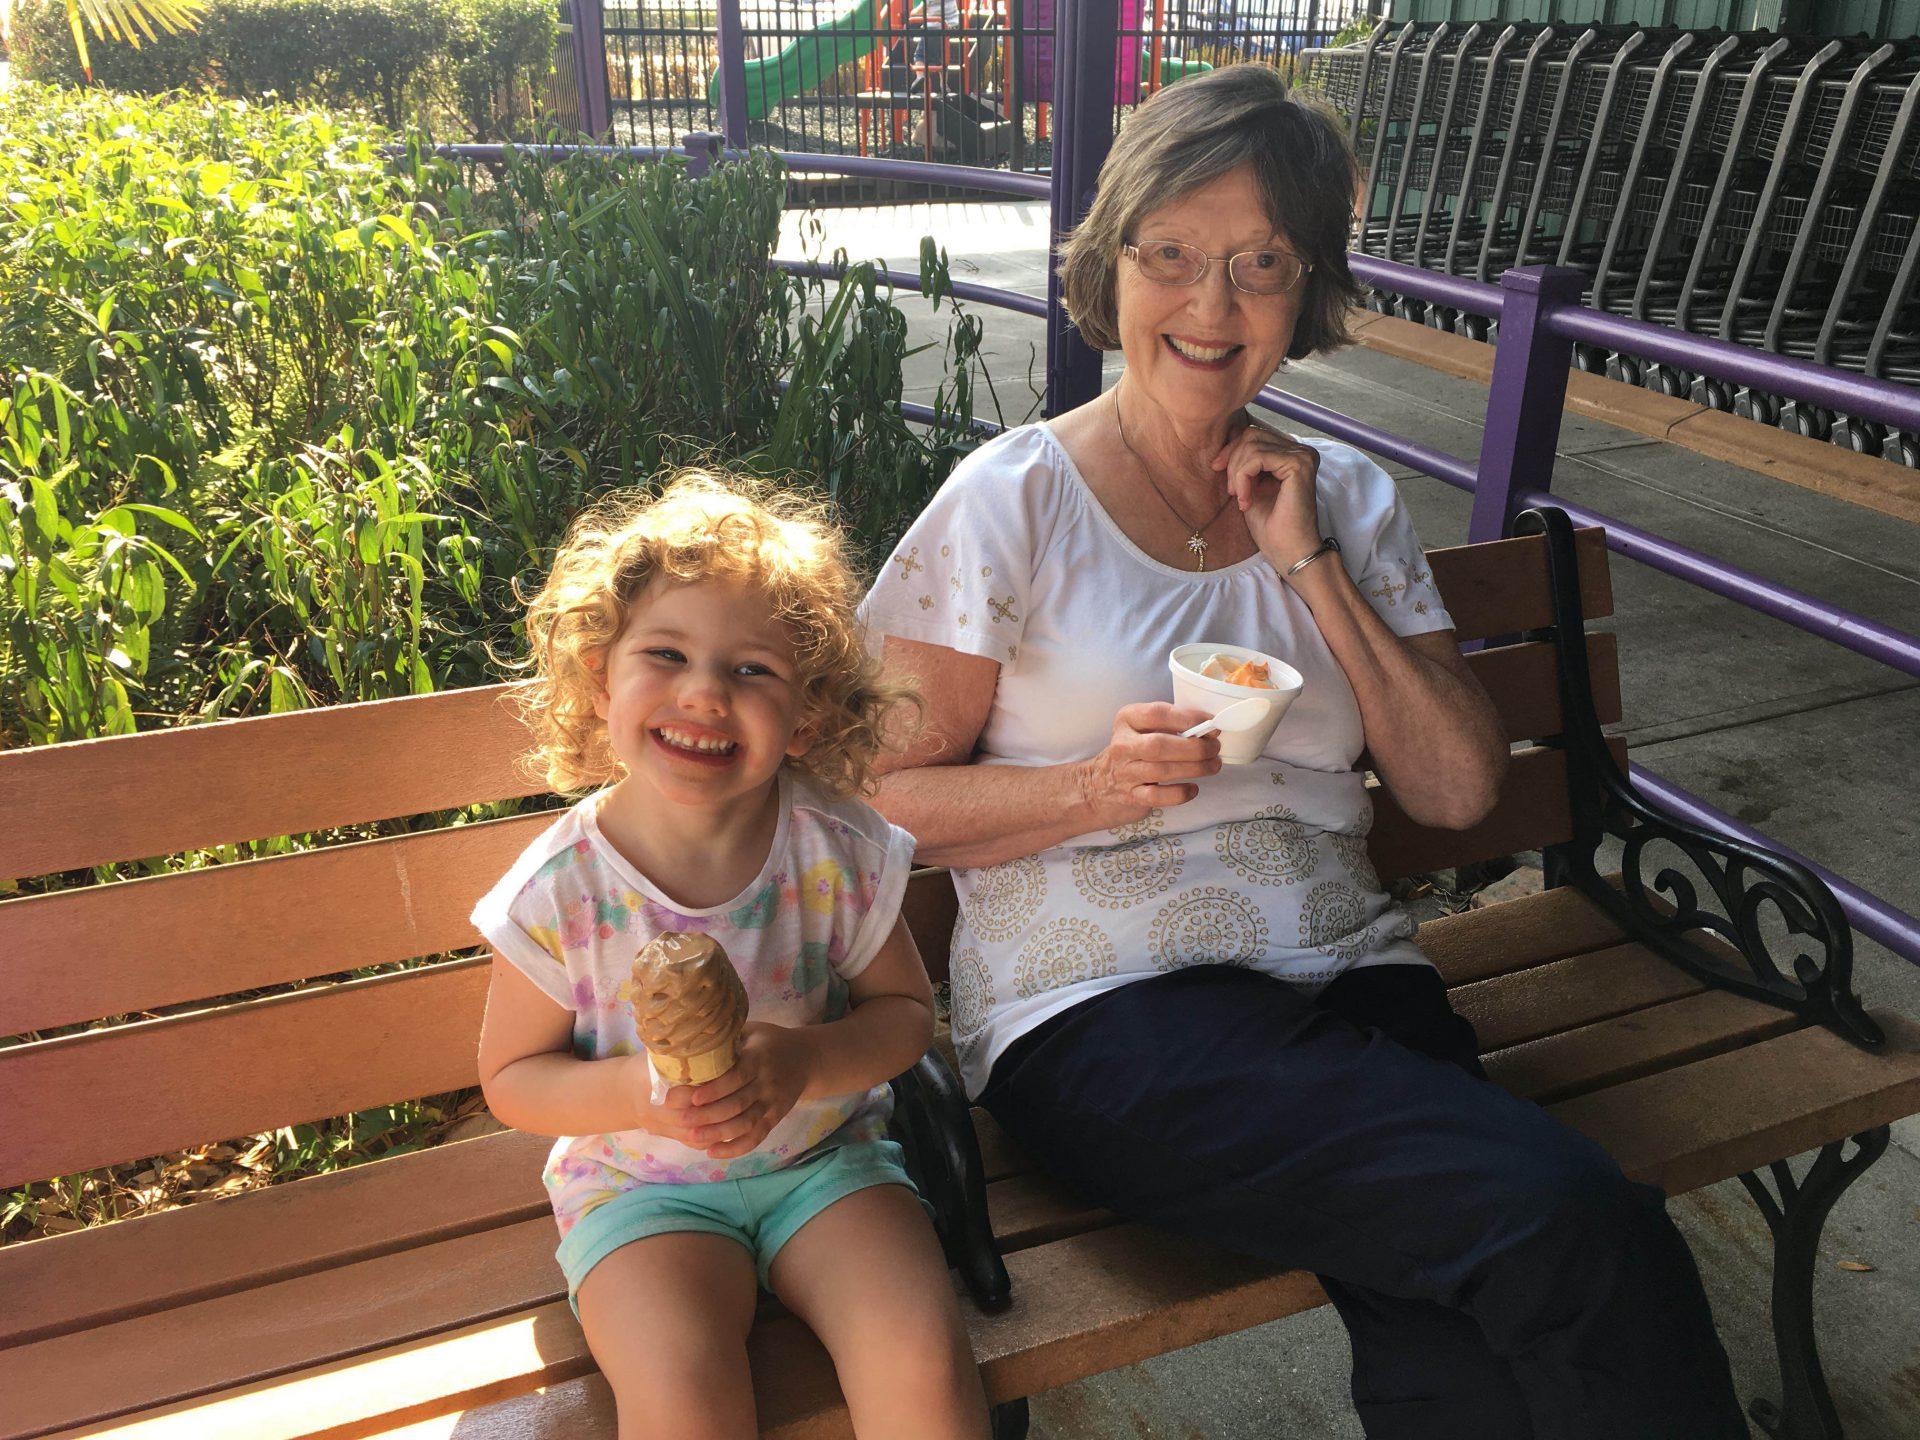 Ice cream treats with Mimi